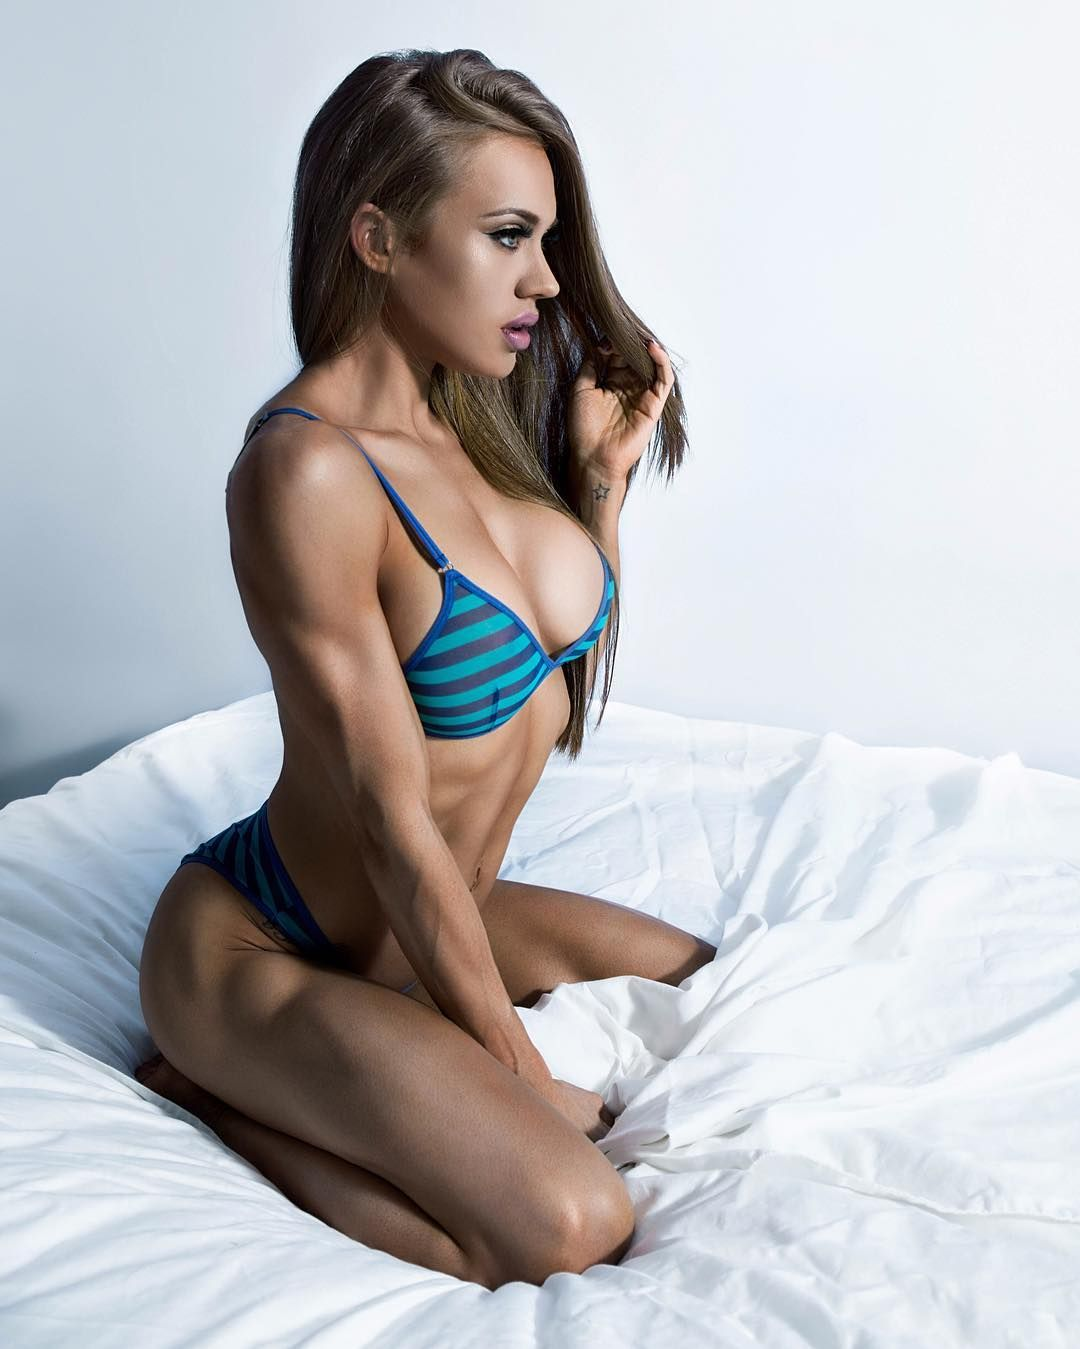 Selfie Samantha Skolkin nudes (24 photo), Pussy, Bikini, Boobs, legs 2017